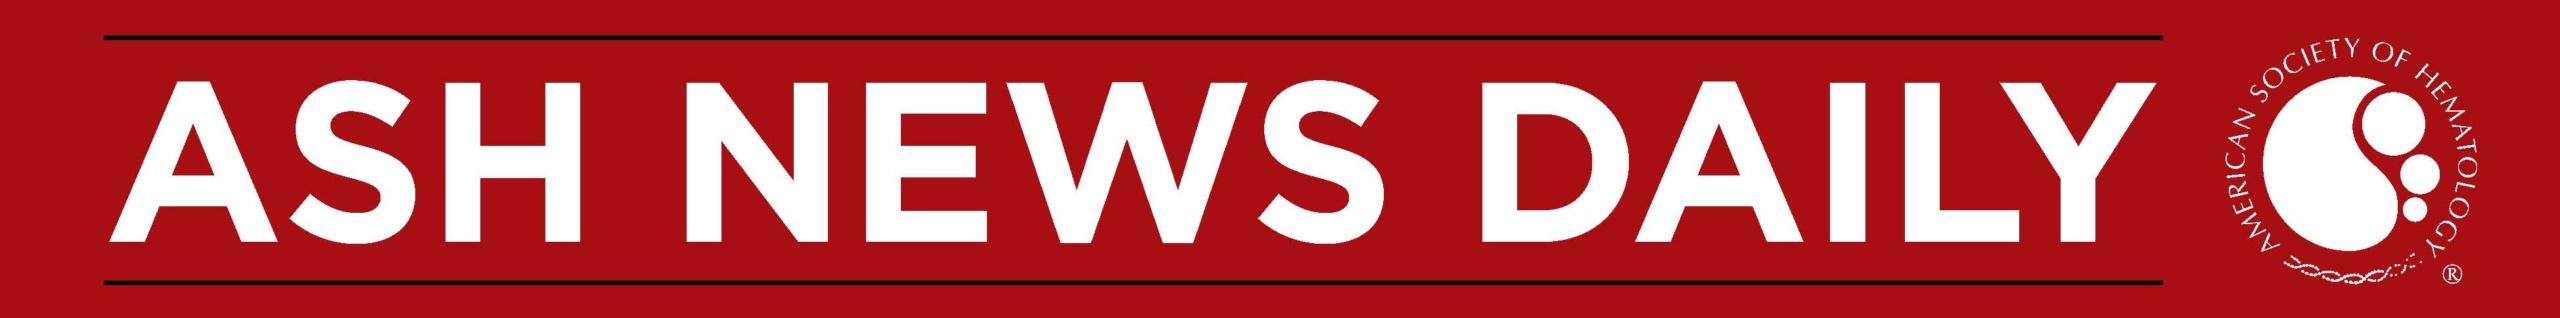 ASH News Daily